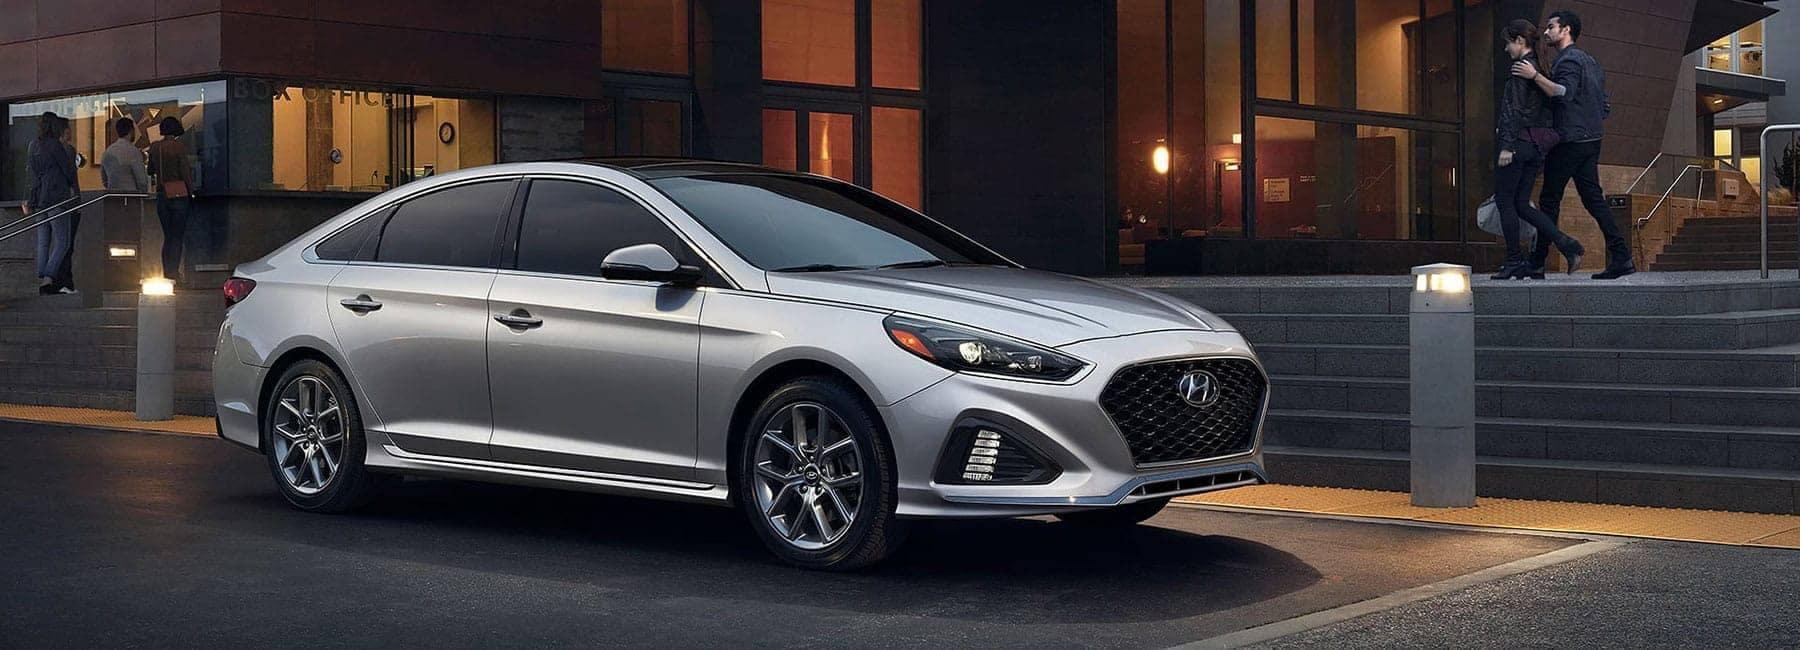 2019 Silver Hyundai Sonata parked in a modern area